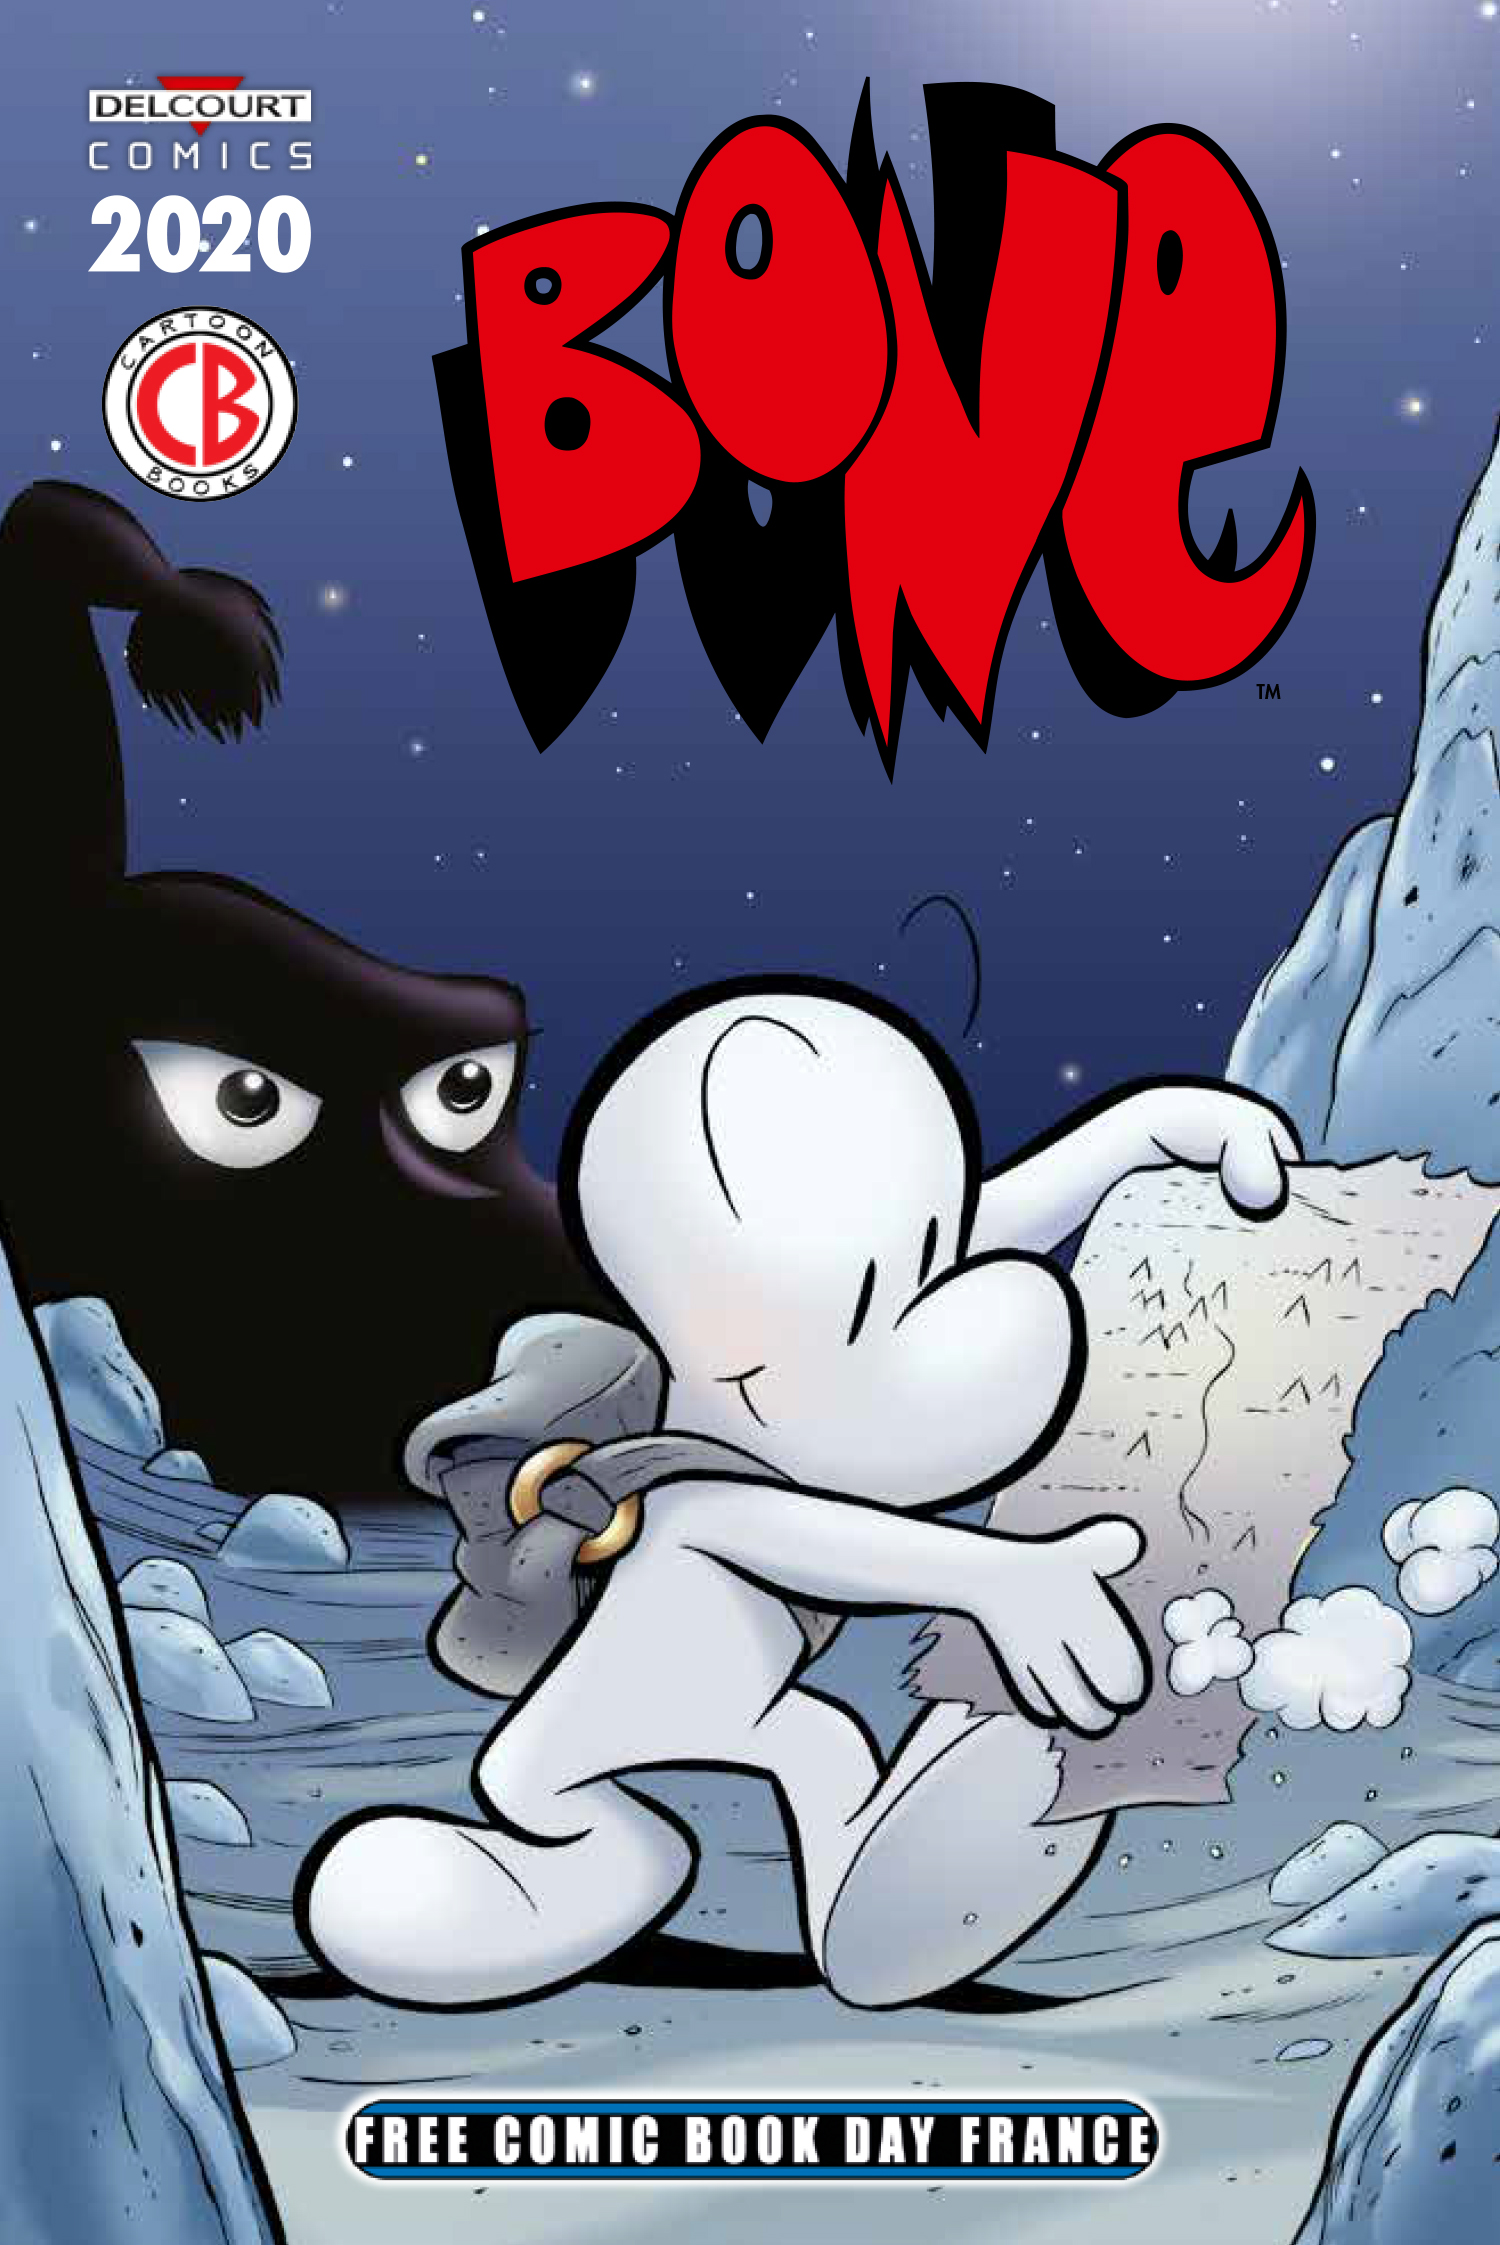 FCBD2020 - Bone